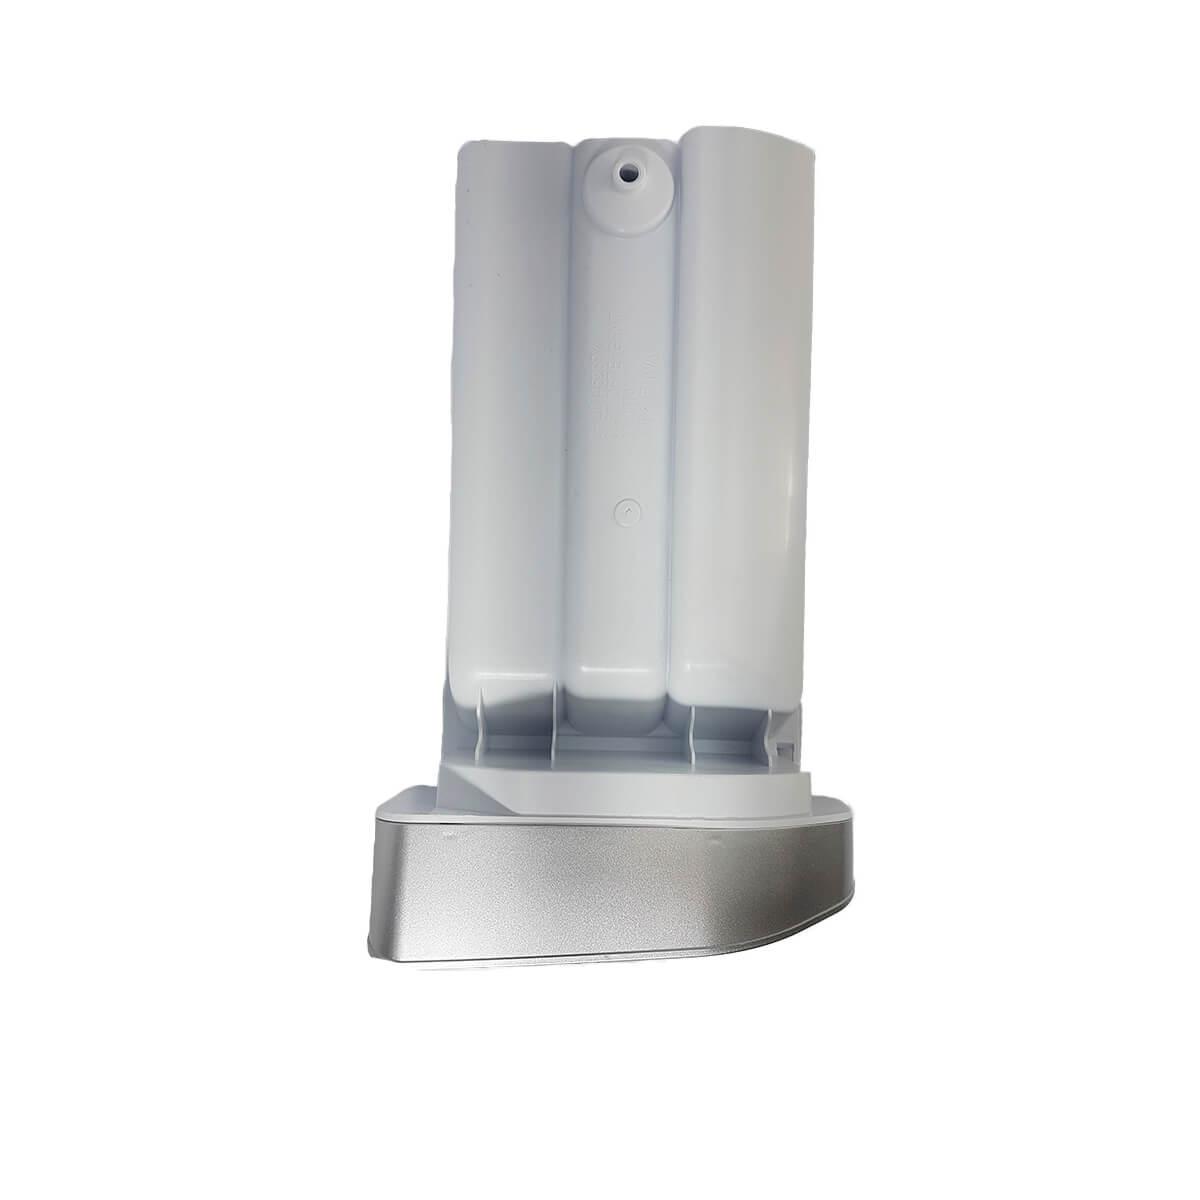 Gaveta Multidispenser Completa Lava e Seca LSI09 Electrolux -  36111T1P30